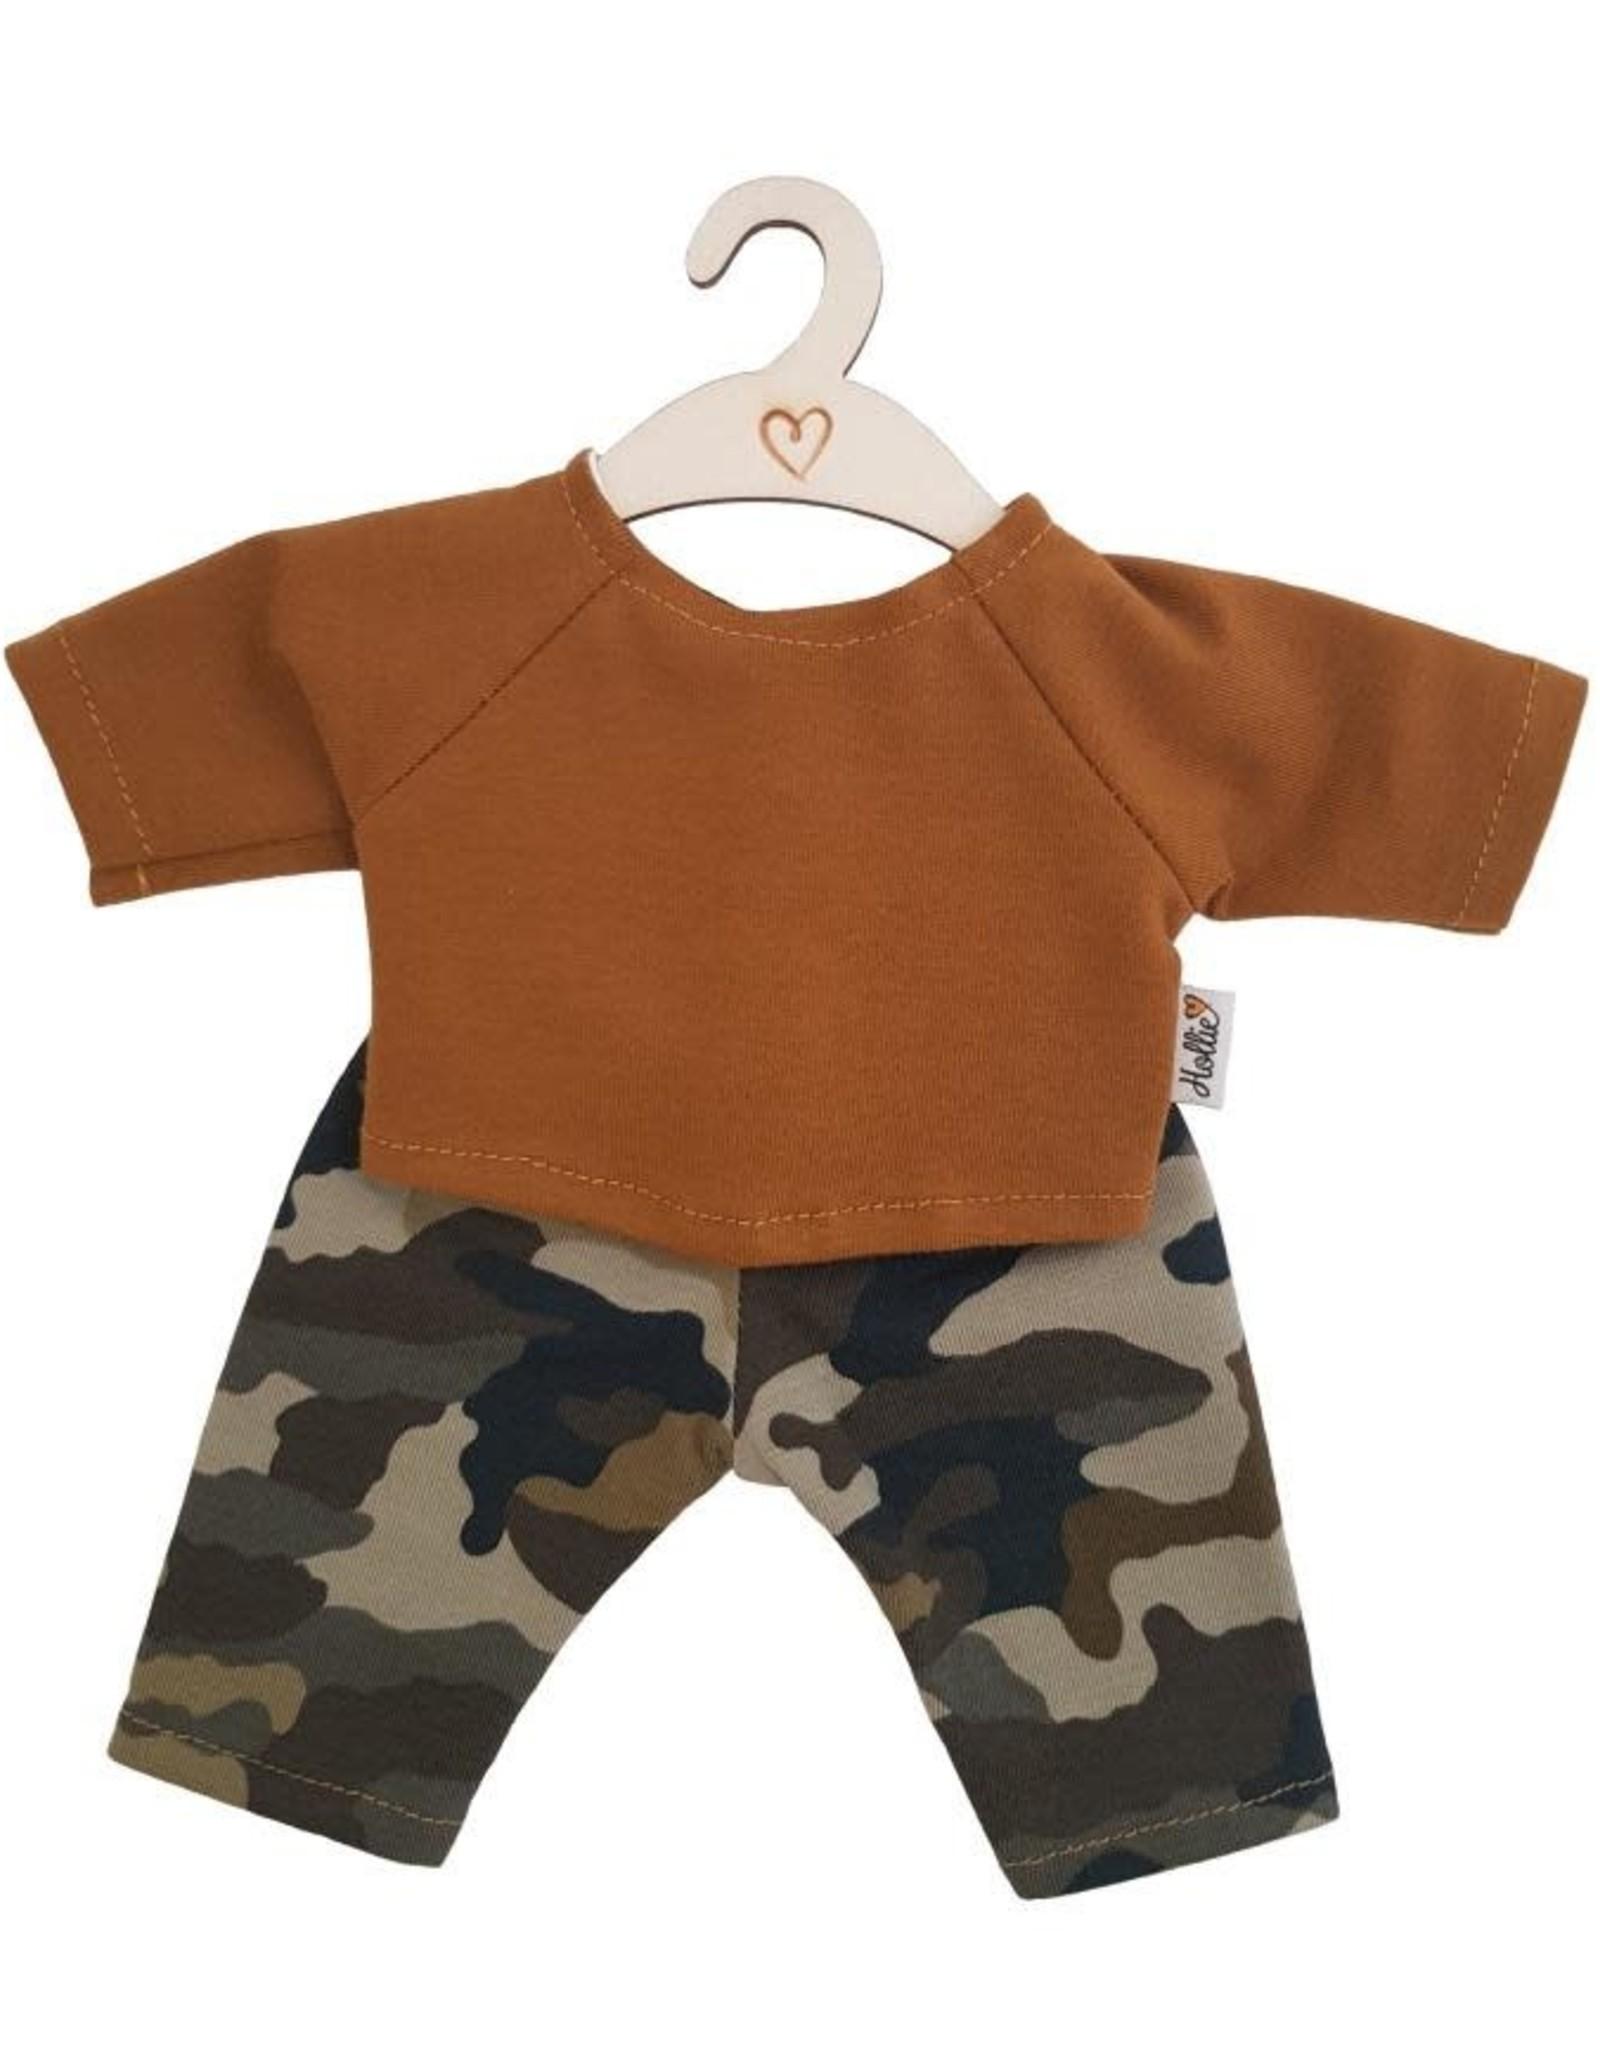 Hollie Hollie kledingsetje shirt en camouflagebroek